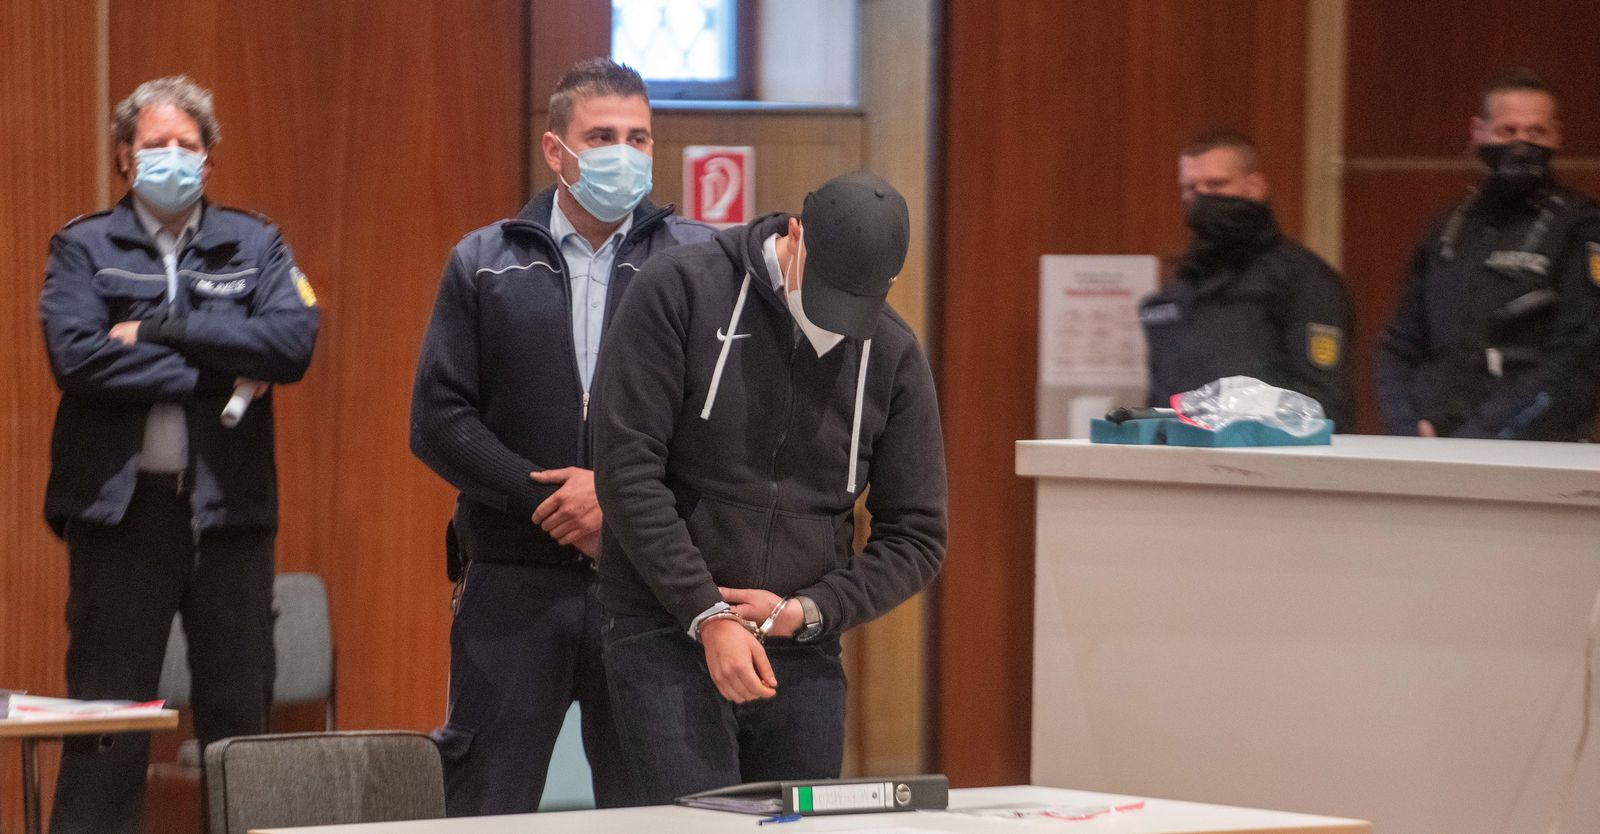 Prozess Brandanschlag auf Roma-Familie